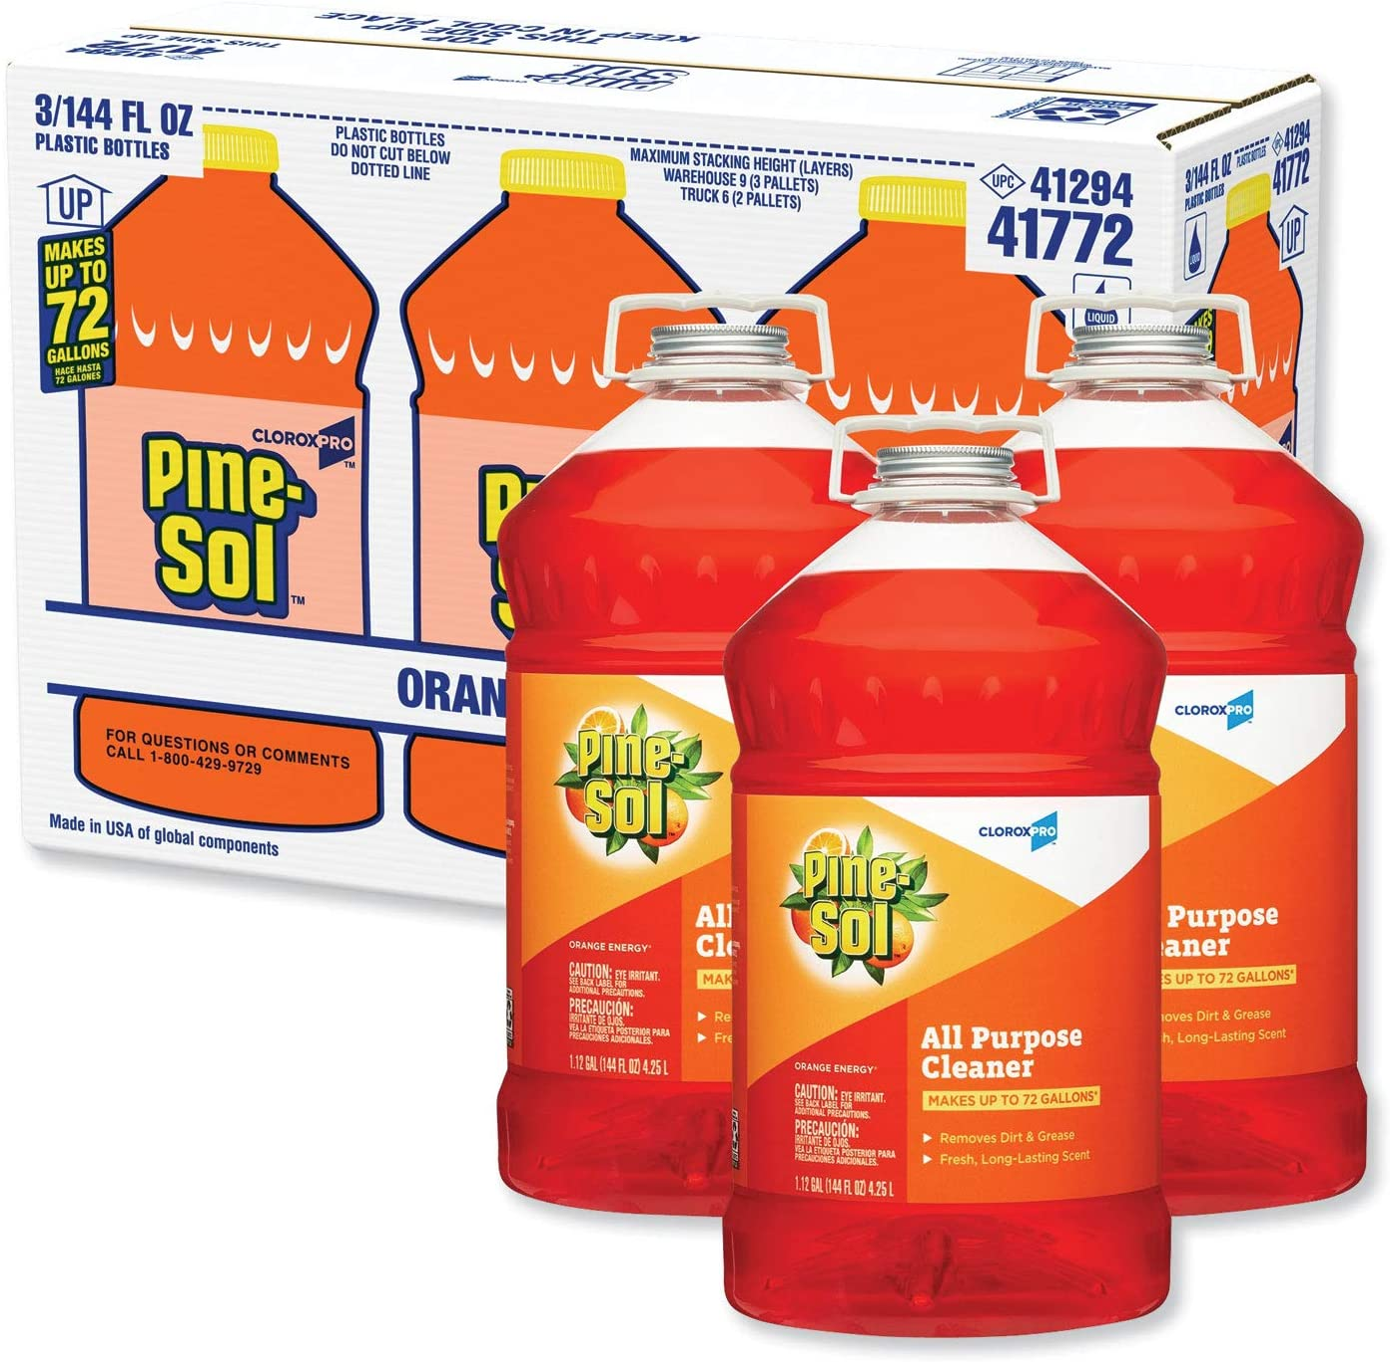 All-Purpose Cleaner Orange Energy 144 Carton oz New York Mall 1 year warranty Bottle 3